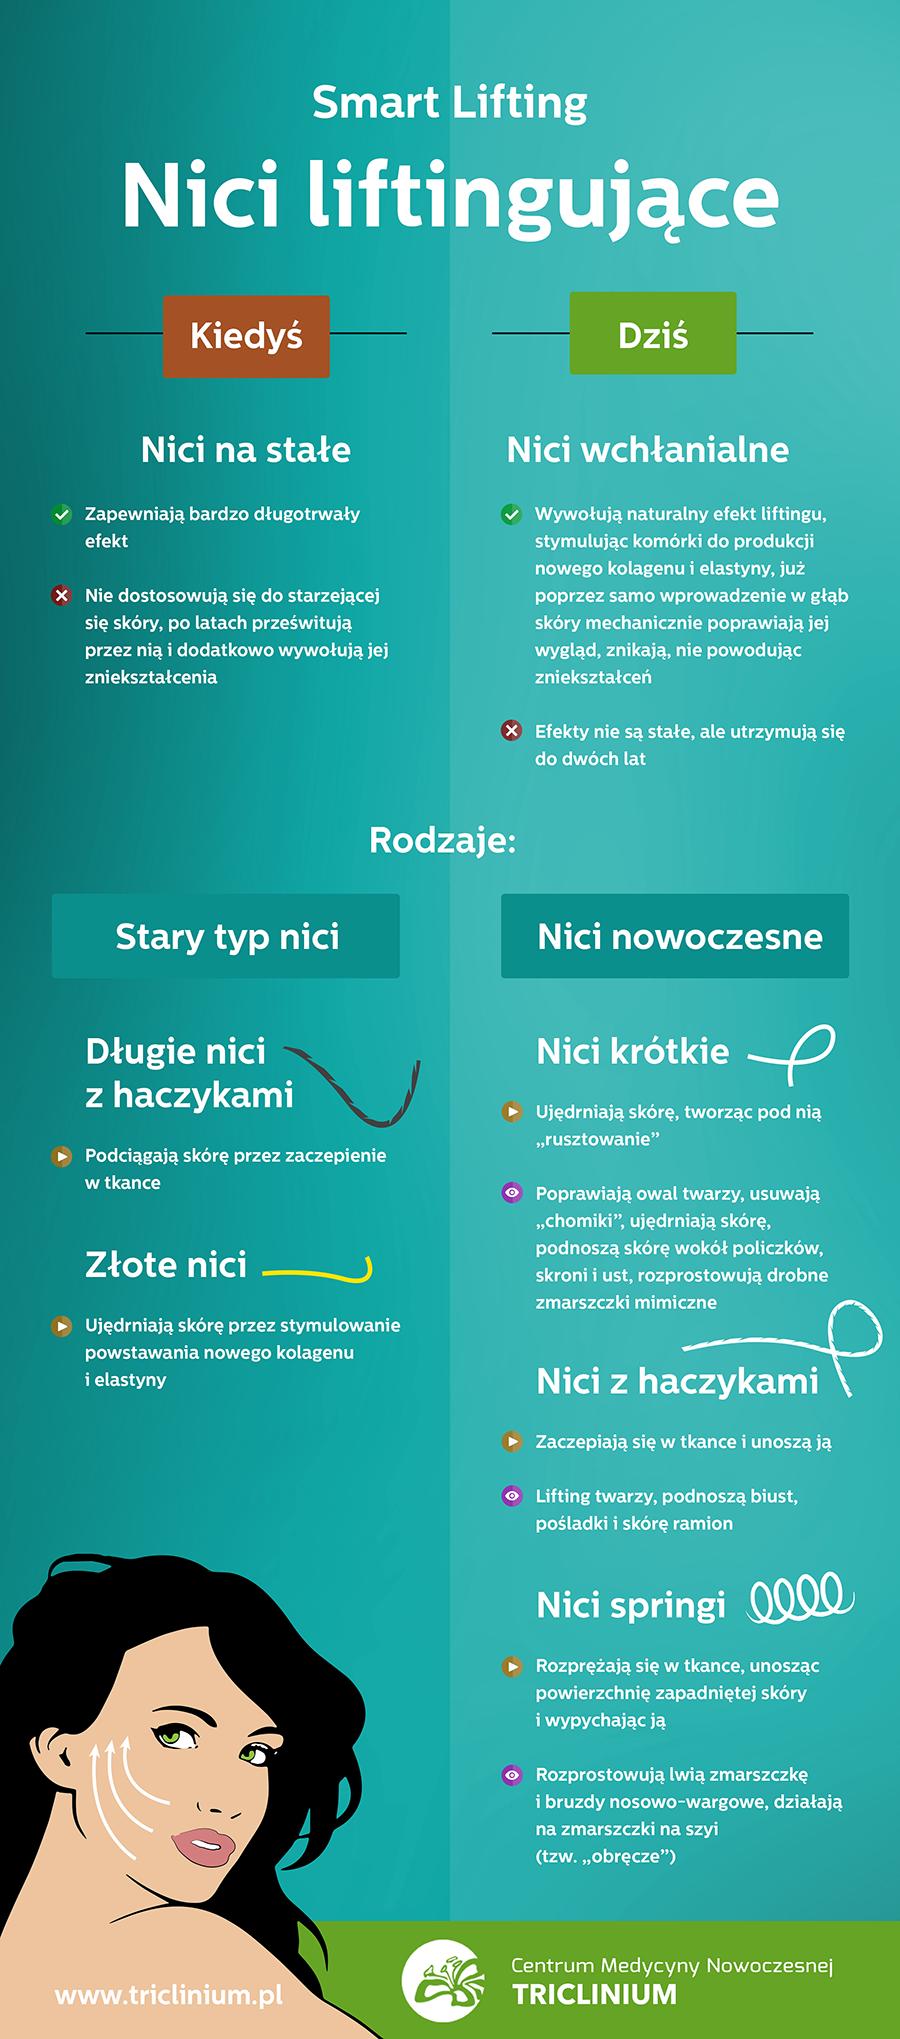 infografika_nici_liftingujące, autor Triclinium